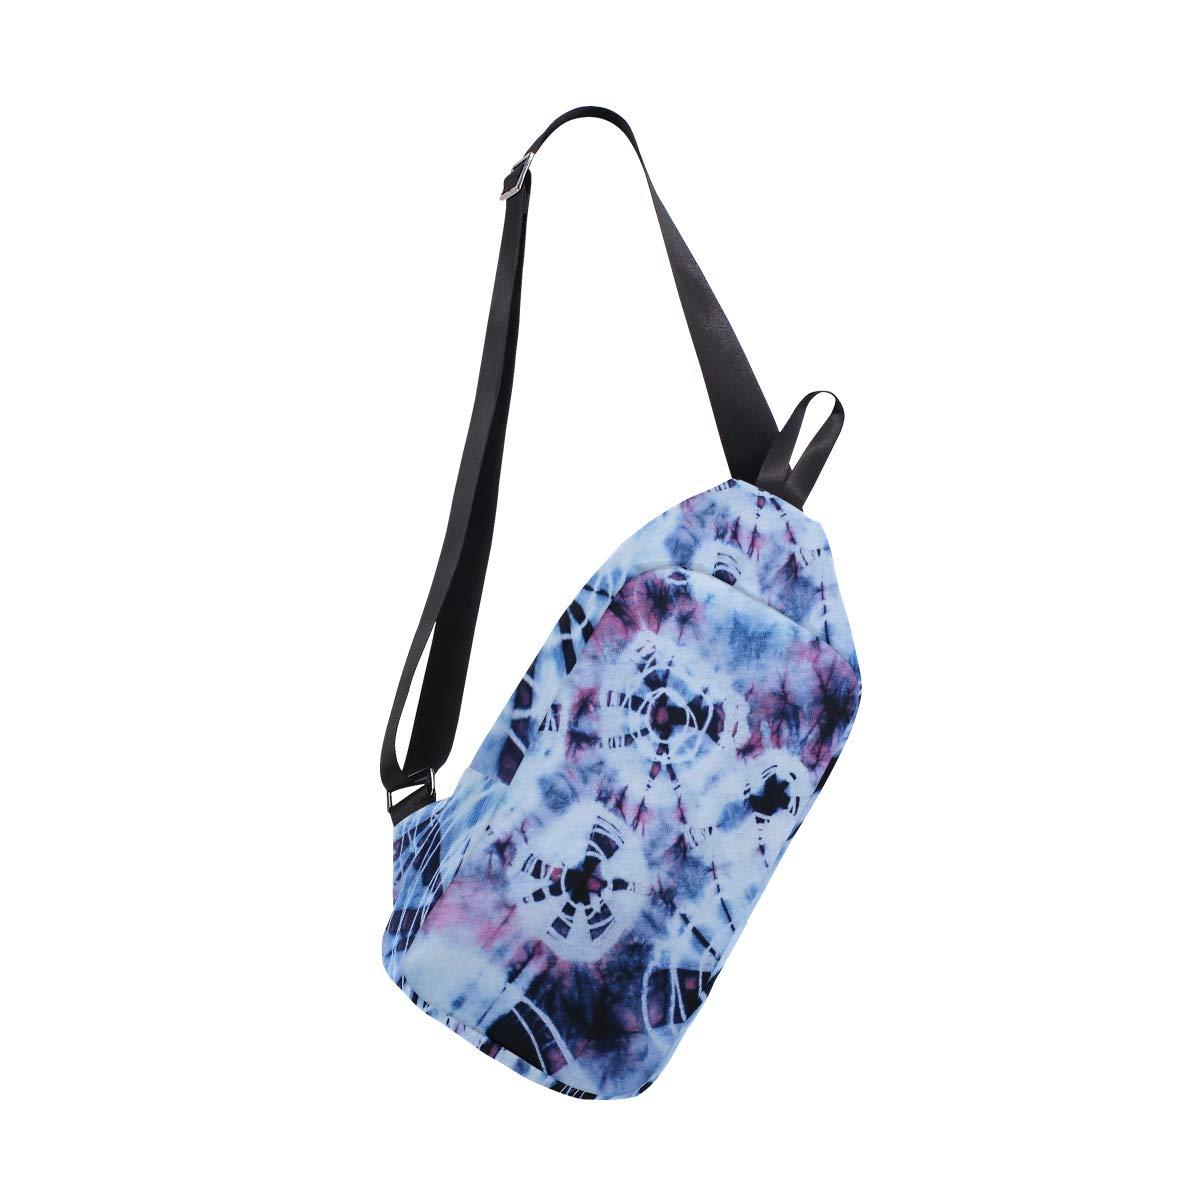 TFONE Abstract Tie Dye Swirll Crossbody Bag Lightweight Chest Shoulder Messenger Pack Backpack Sling Bag